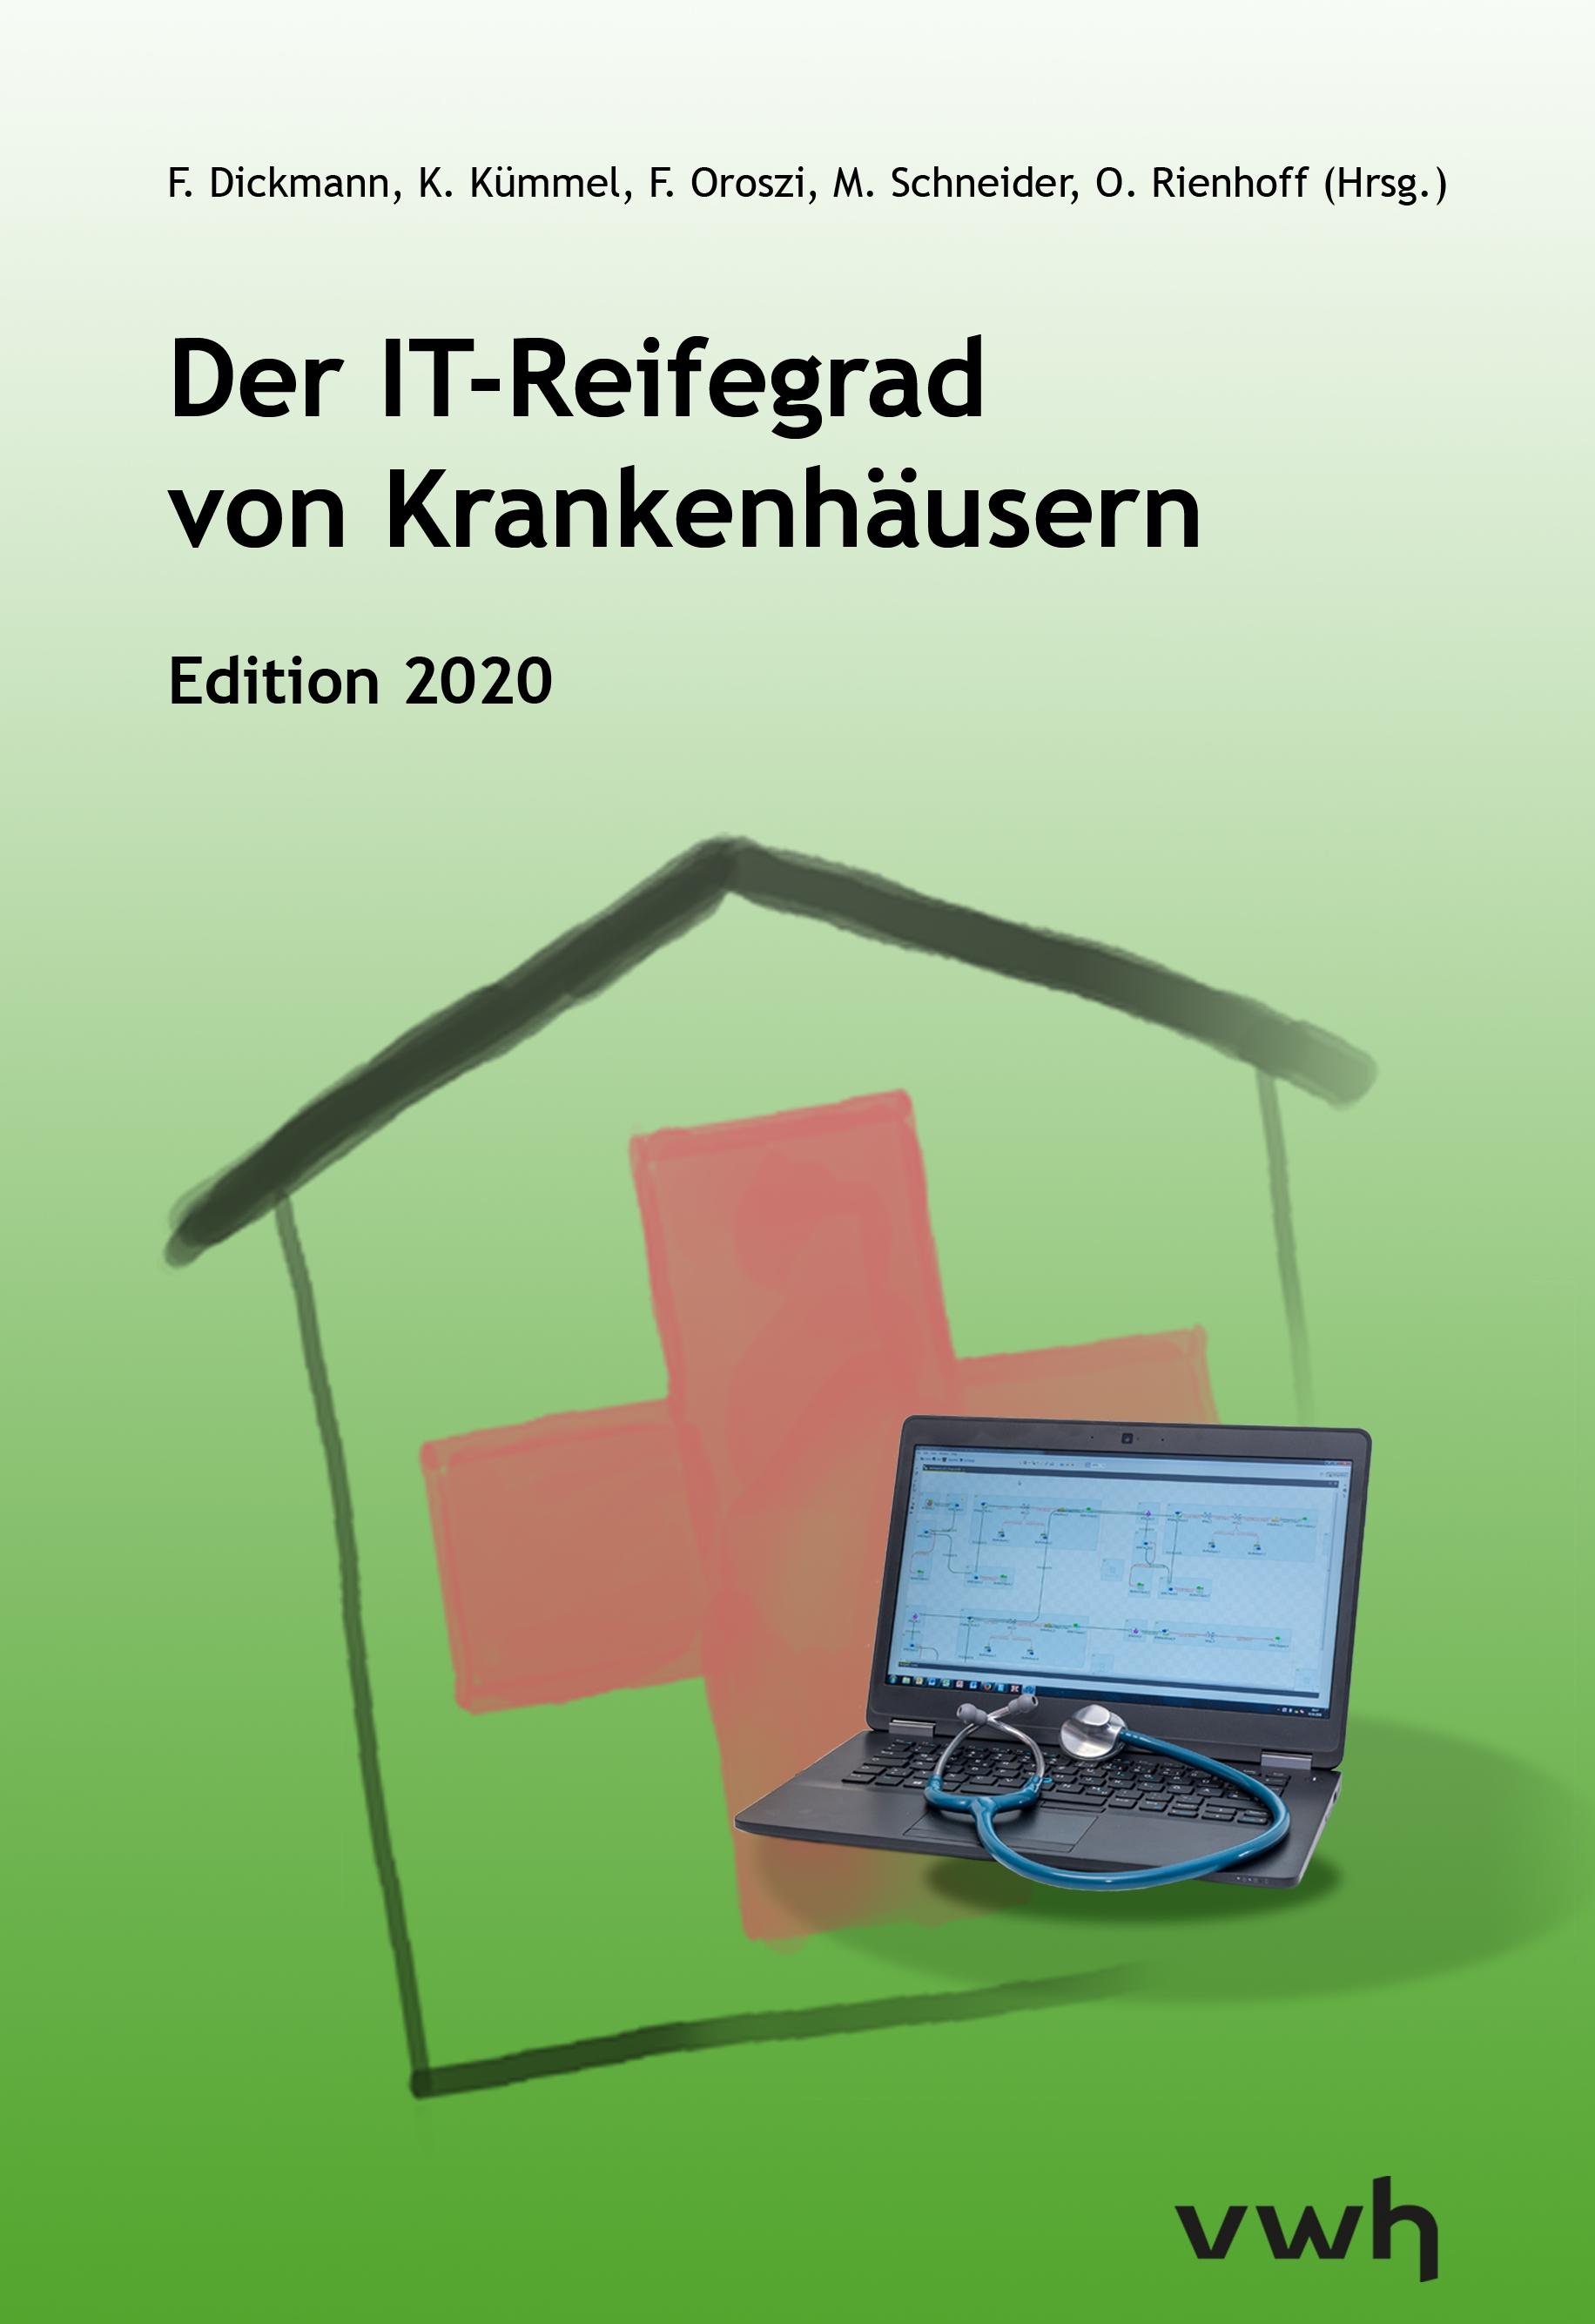 Cover Dickmann 2020